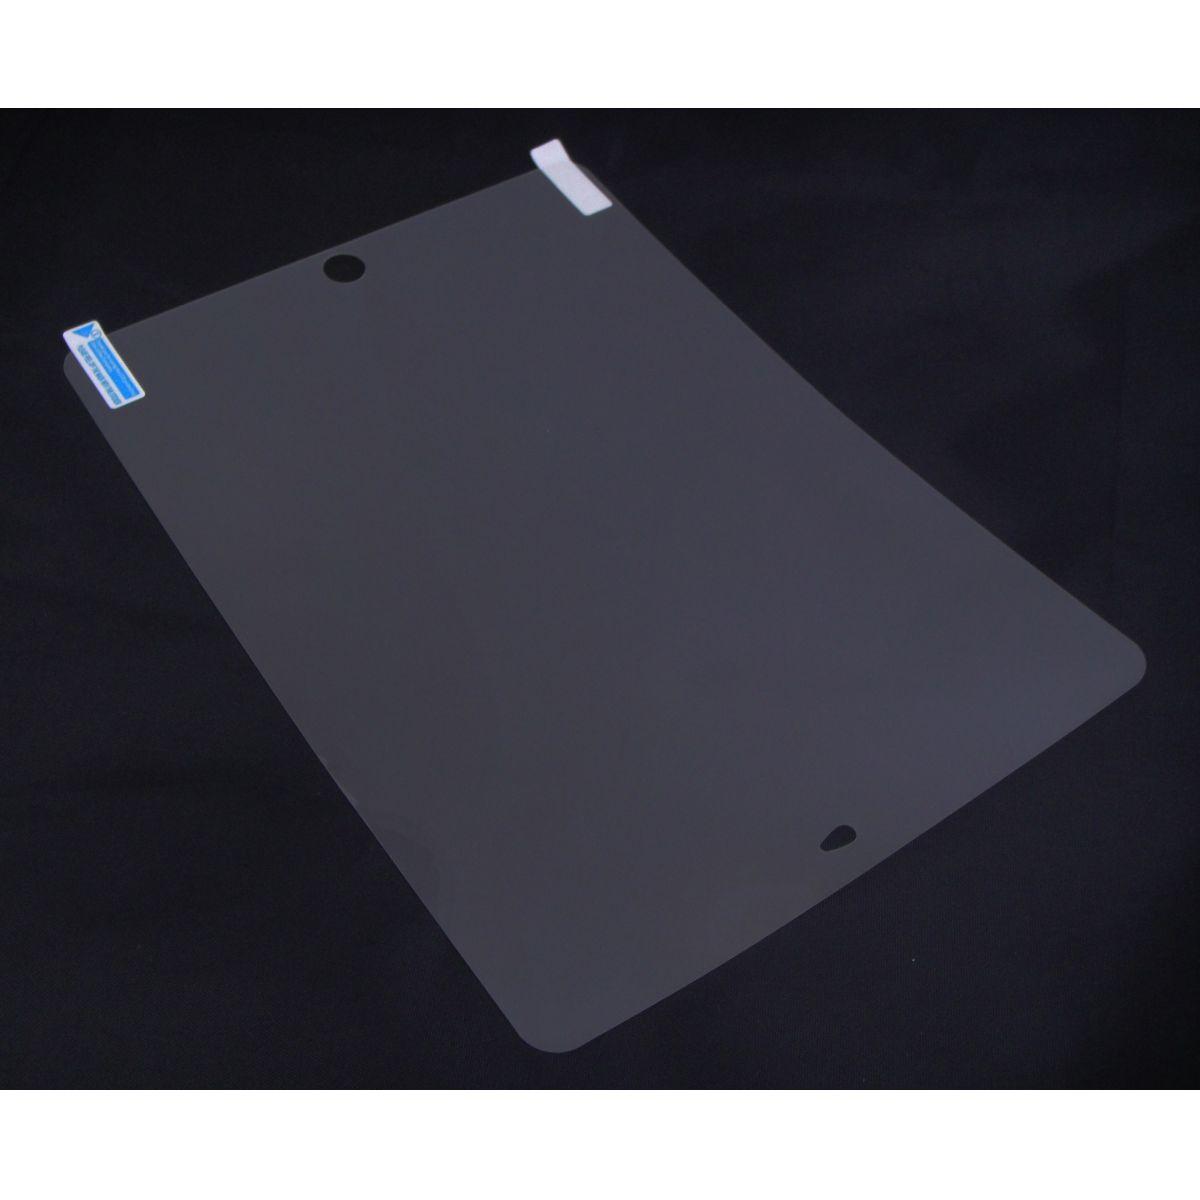 Pelicula protetora para Ipad 5 Air Fosca